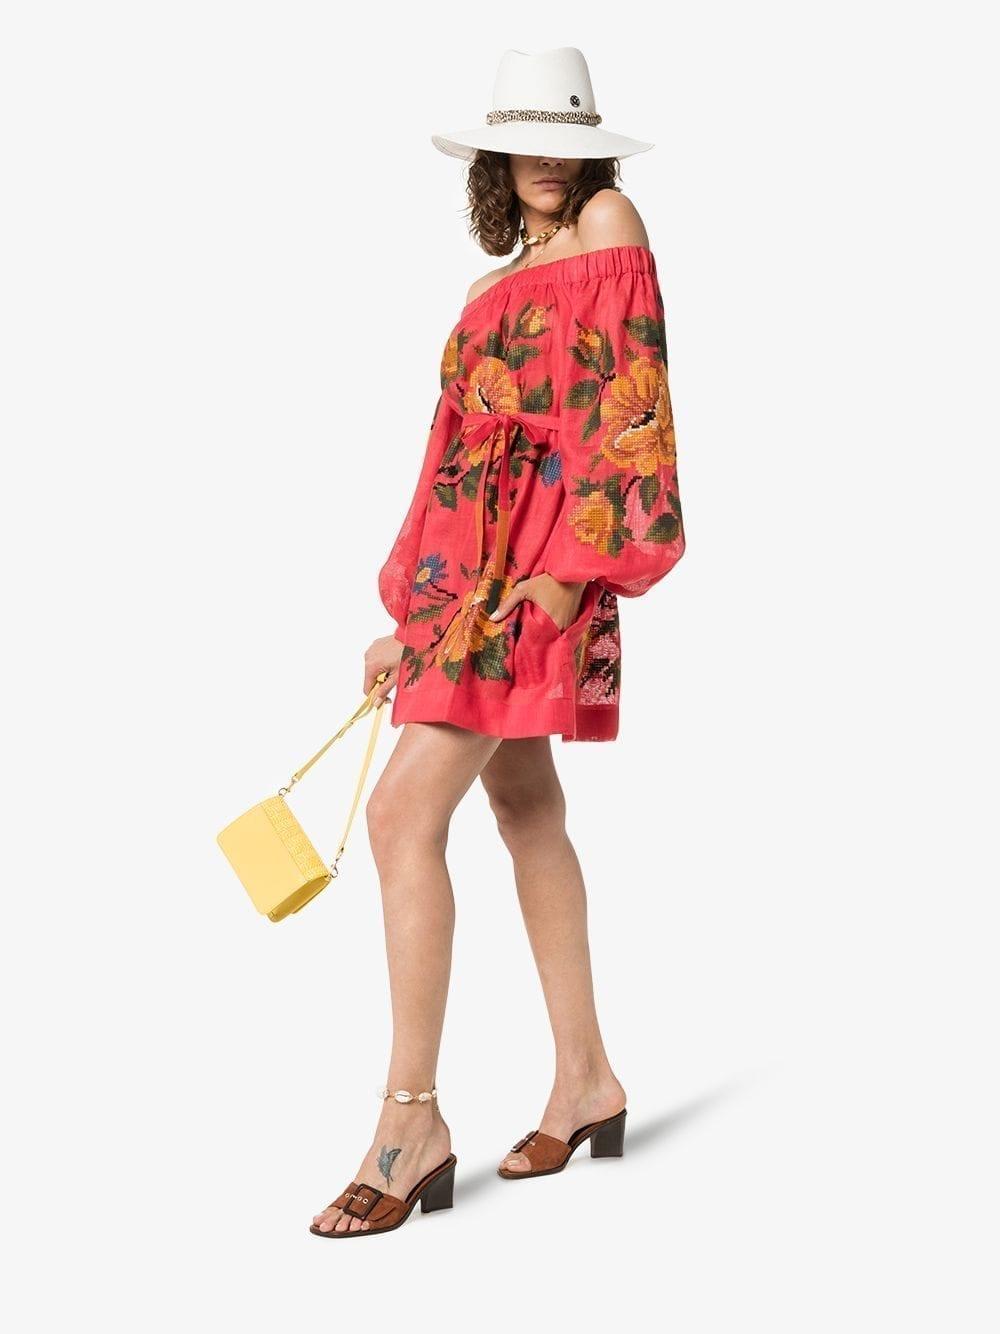 VITA KIN Gypsy Queen Linen Off-the-shoulder Red Dress